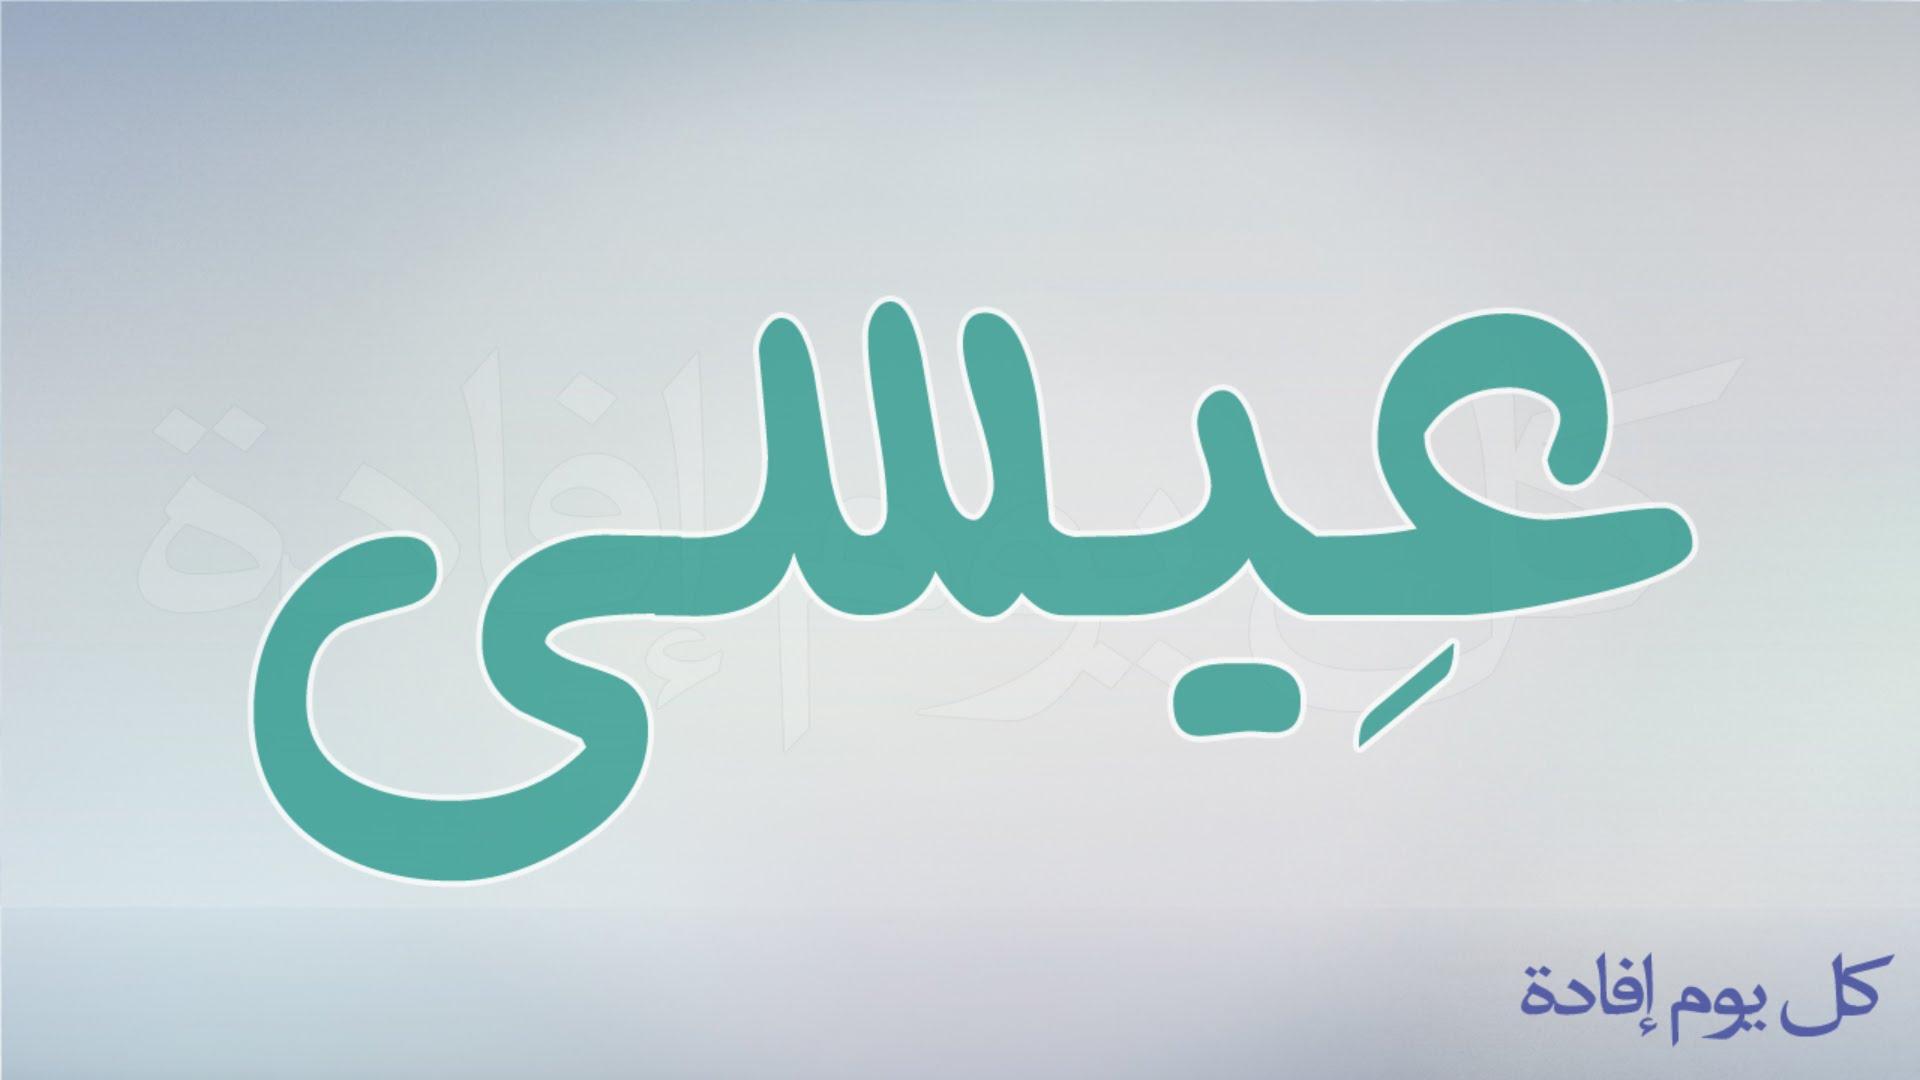 بالصور اسماء اولاد 2019 , اغرب واجمل اسماء ولاد 2138